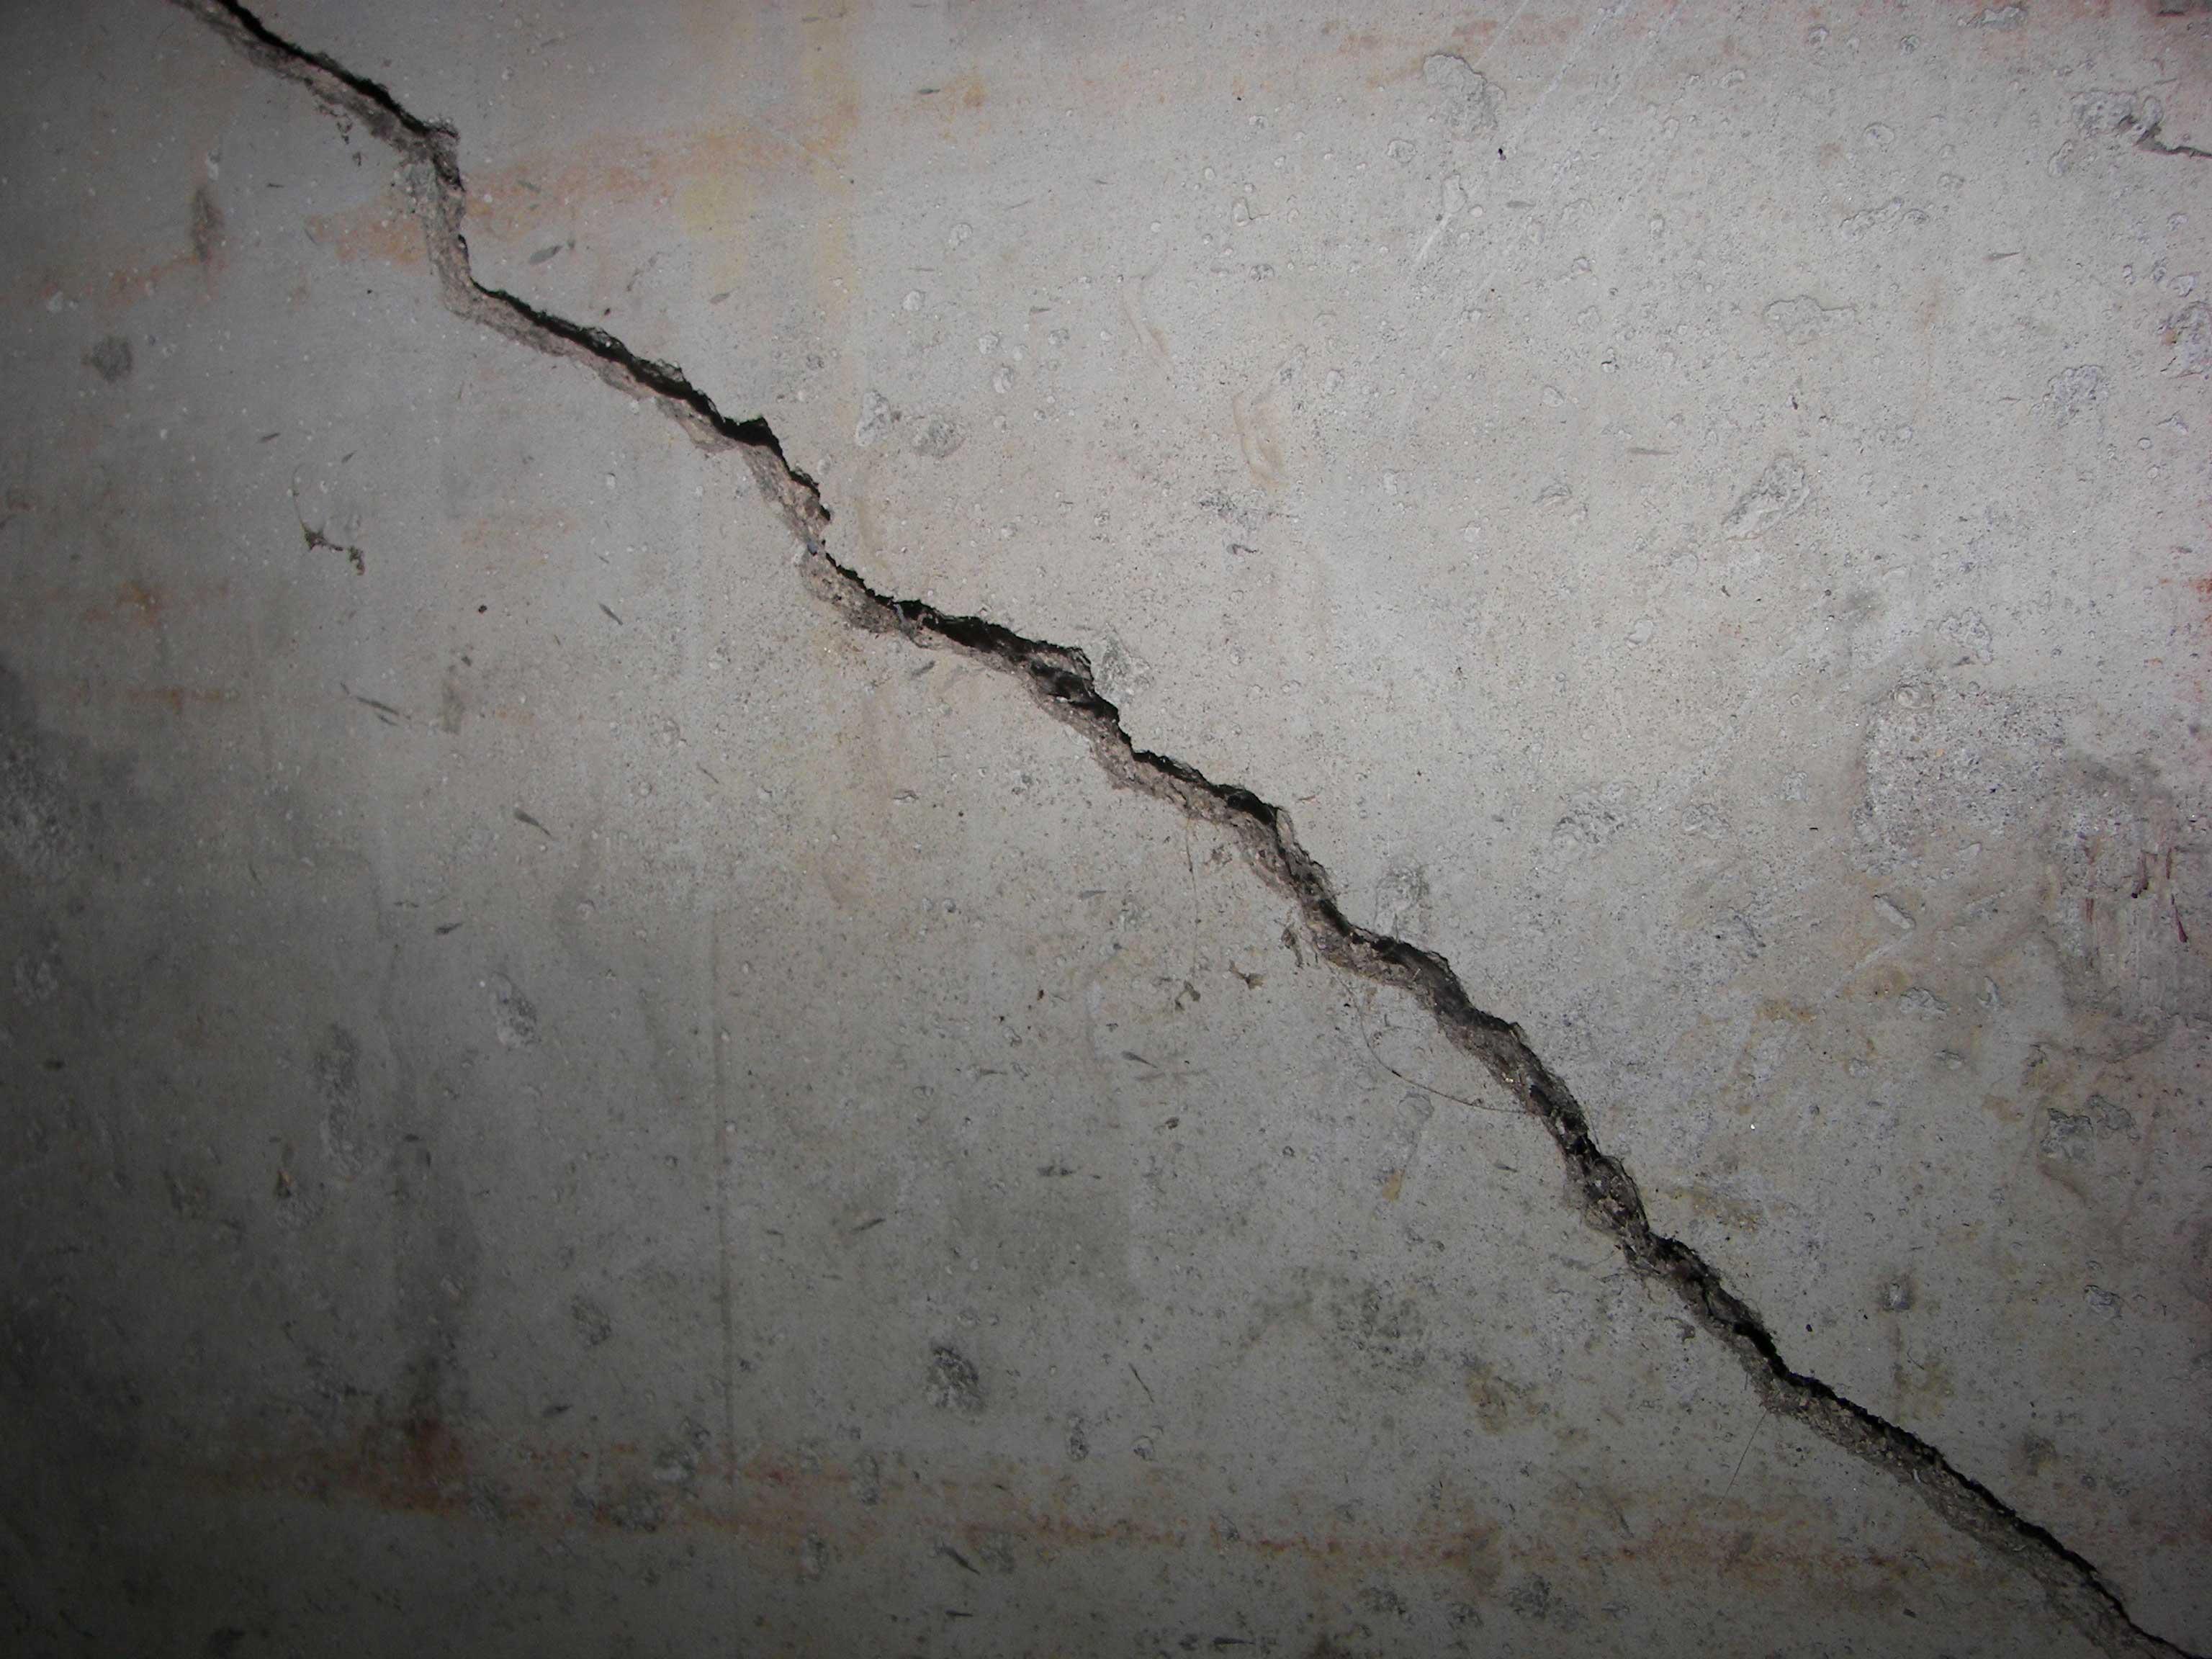 Understanding foundation cracks - Image 3